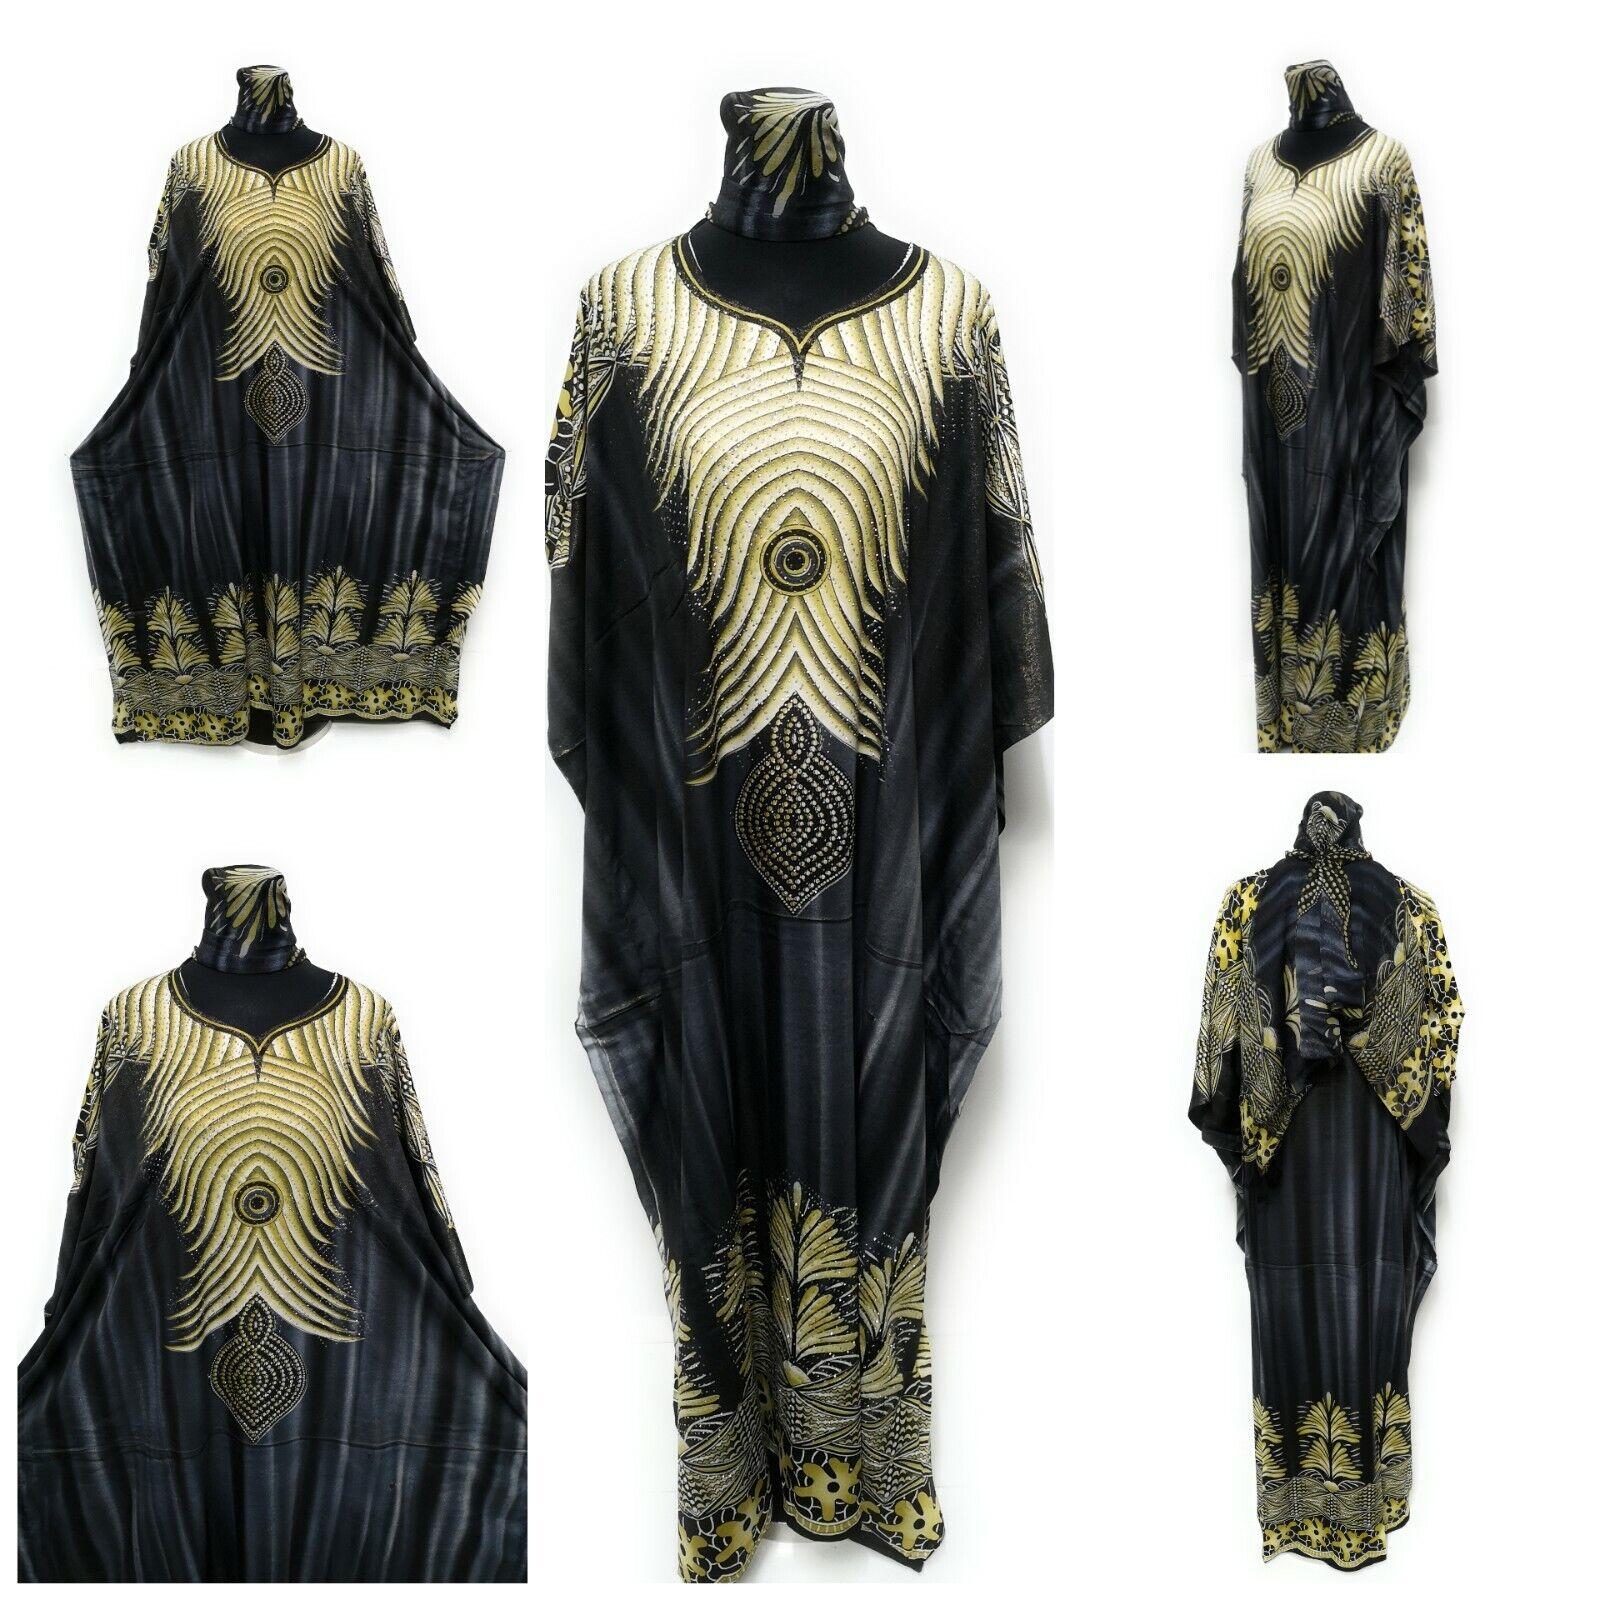 Free Size Kaftan Tunic Holiday Dress Beach Cover up fits 12,14,16,18,20,22,24